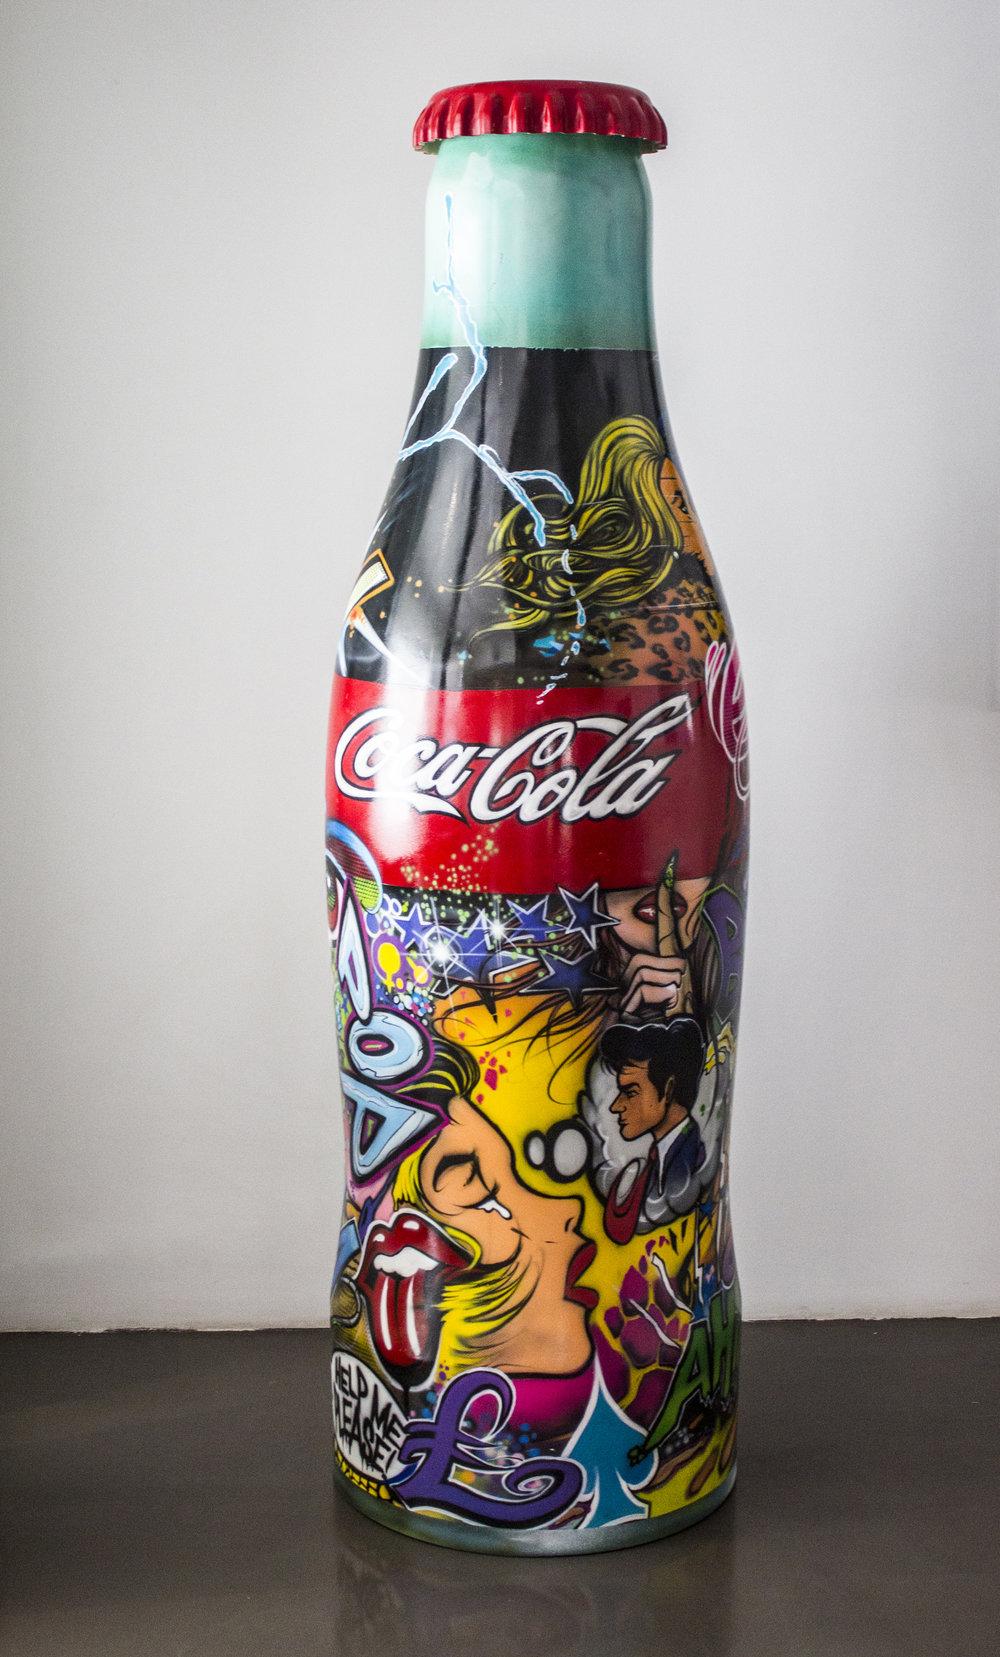 Coca-Cola - 2012Resin and bronze powder1/1200 x 180 x 60 cm